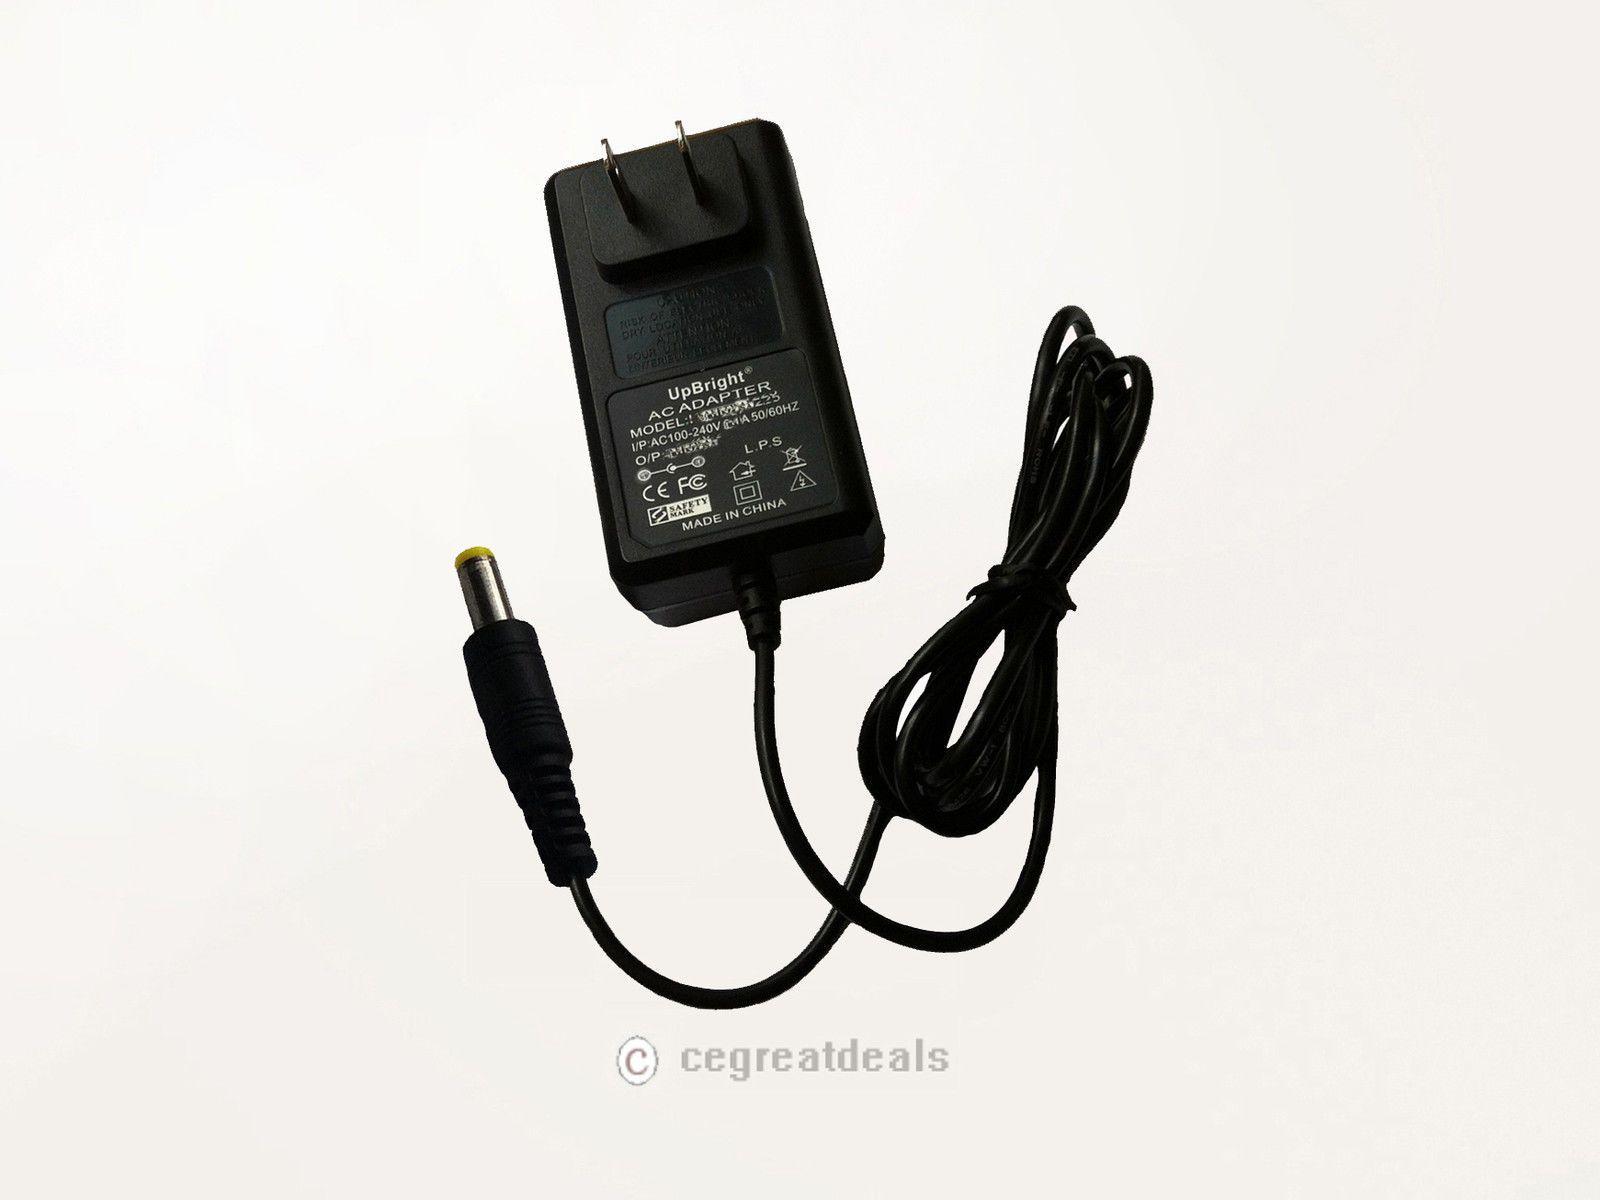 $6 99 - 12V 2 5A 30W Ac Adapter For Yamaha Digital Piano Midi